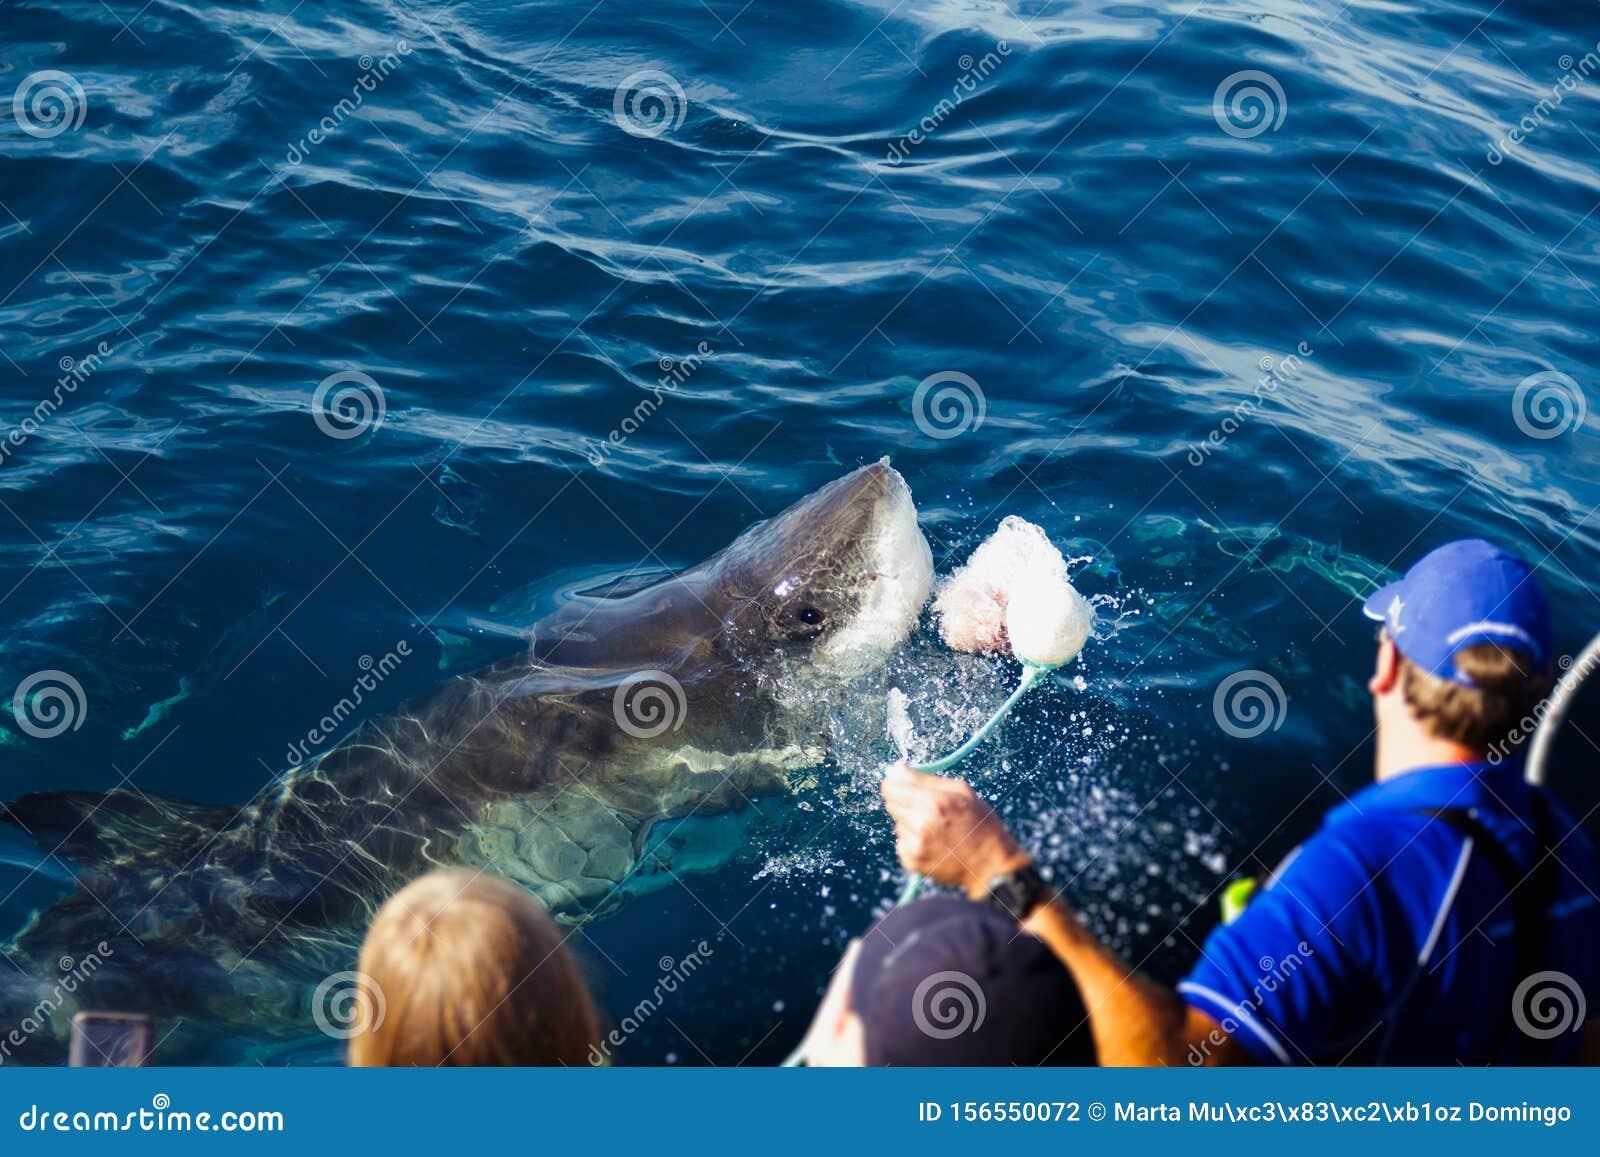 Охота на акул | 1155x1600